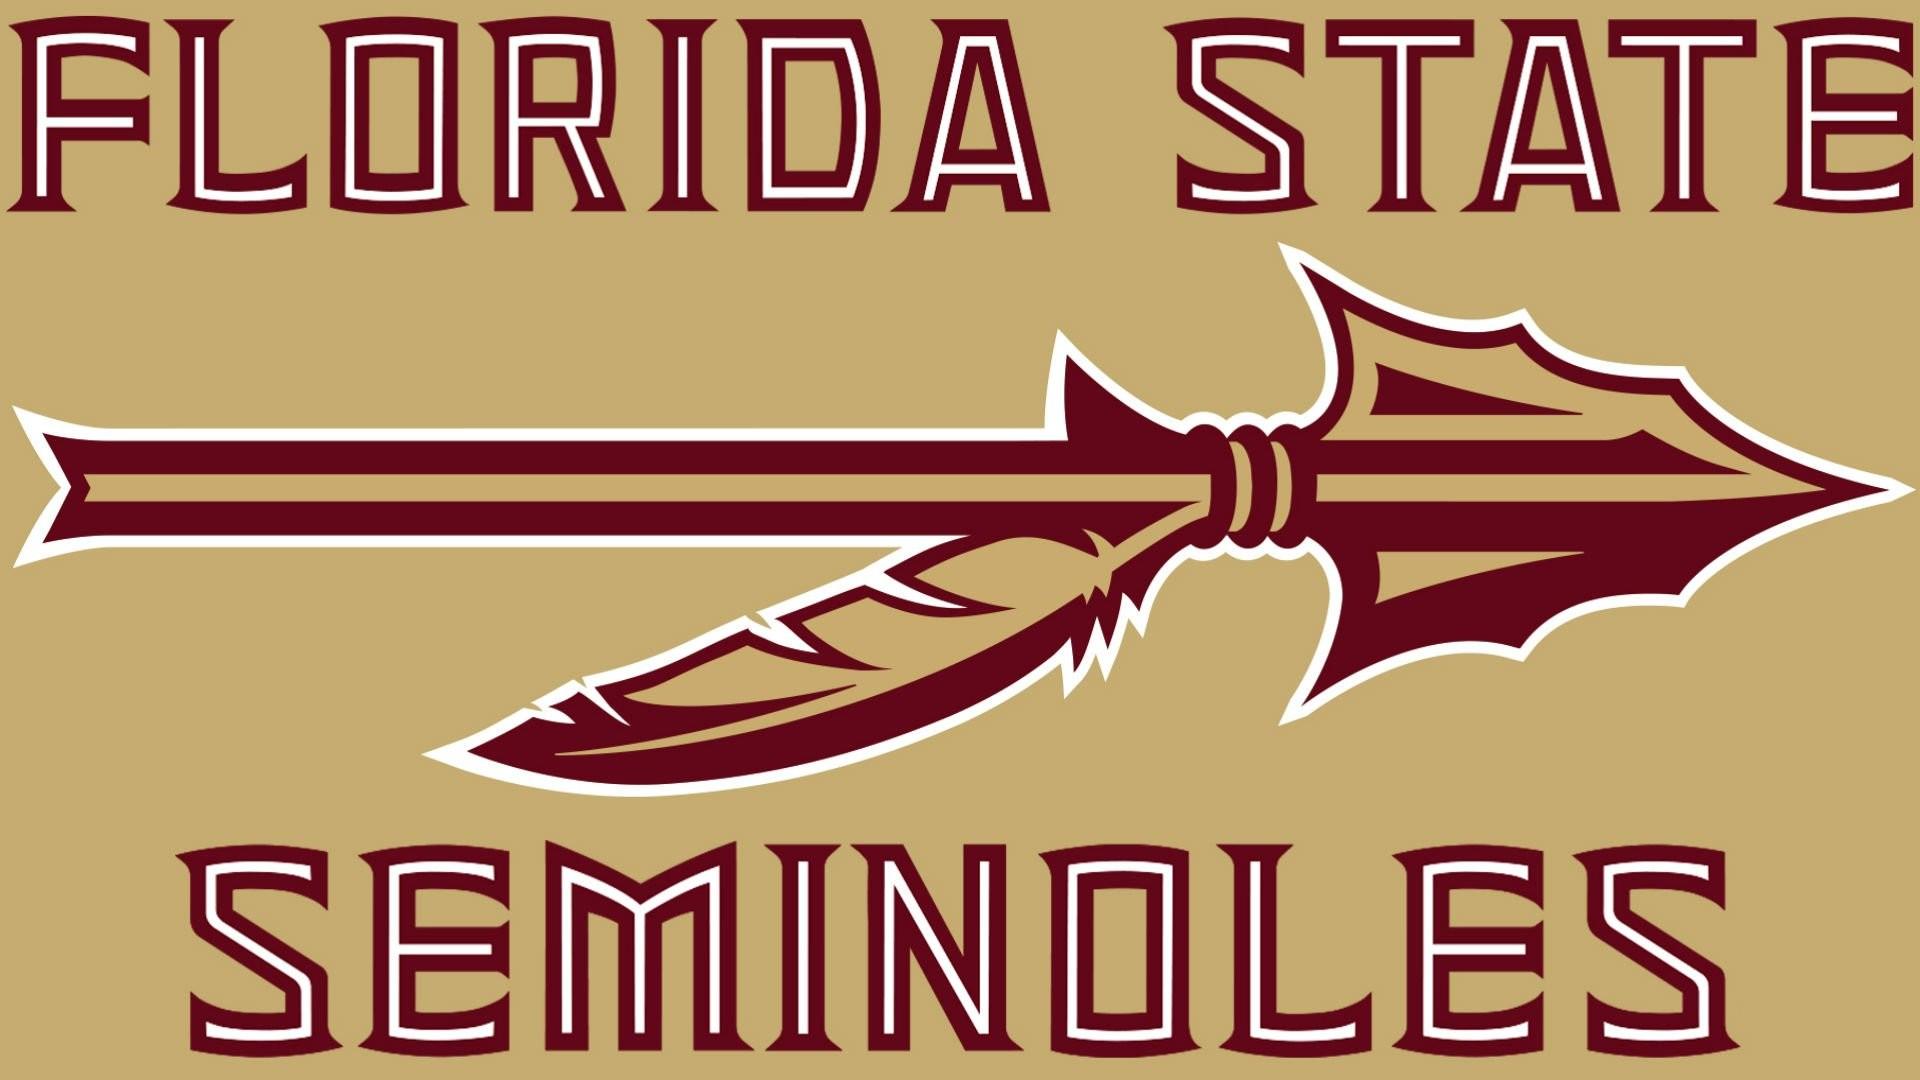 … florida state seminoles college football wallpaper …